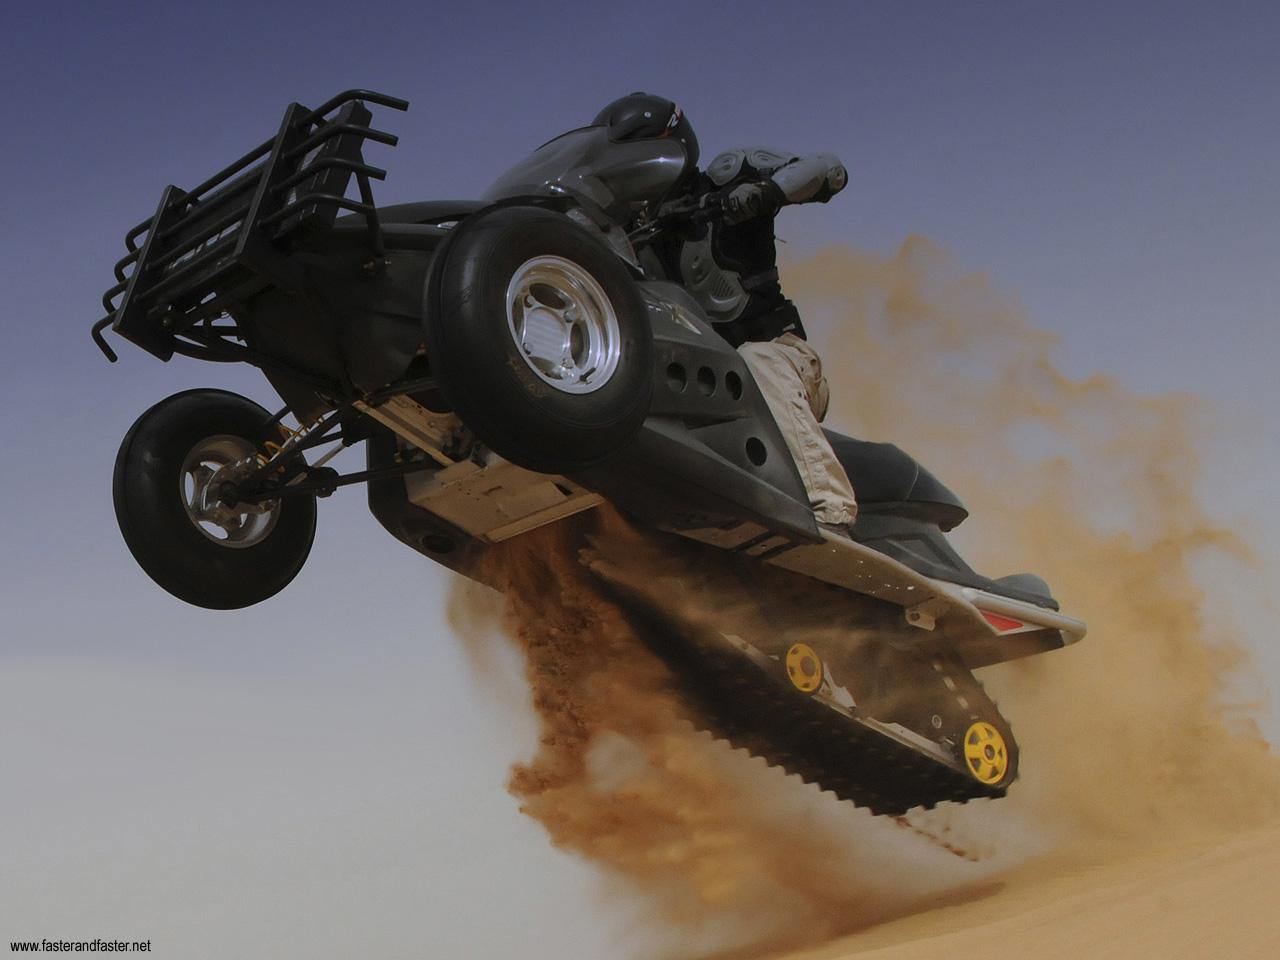 Sand X The Desert S Snowmobile Autoevolution